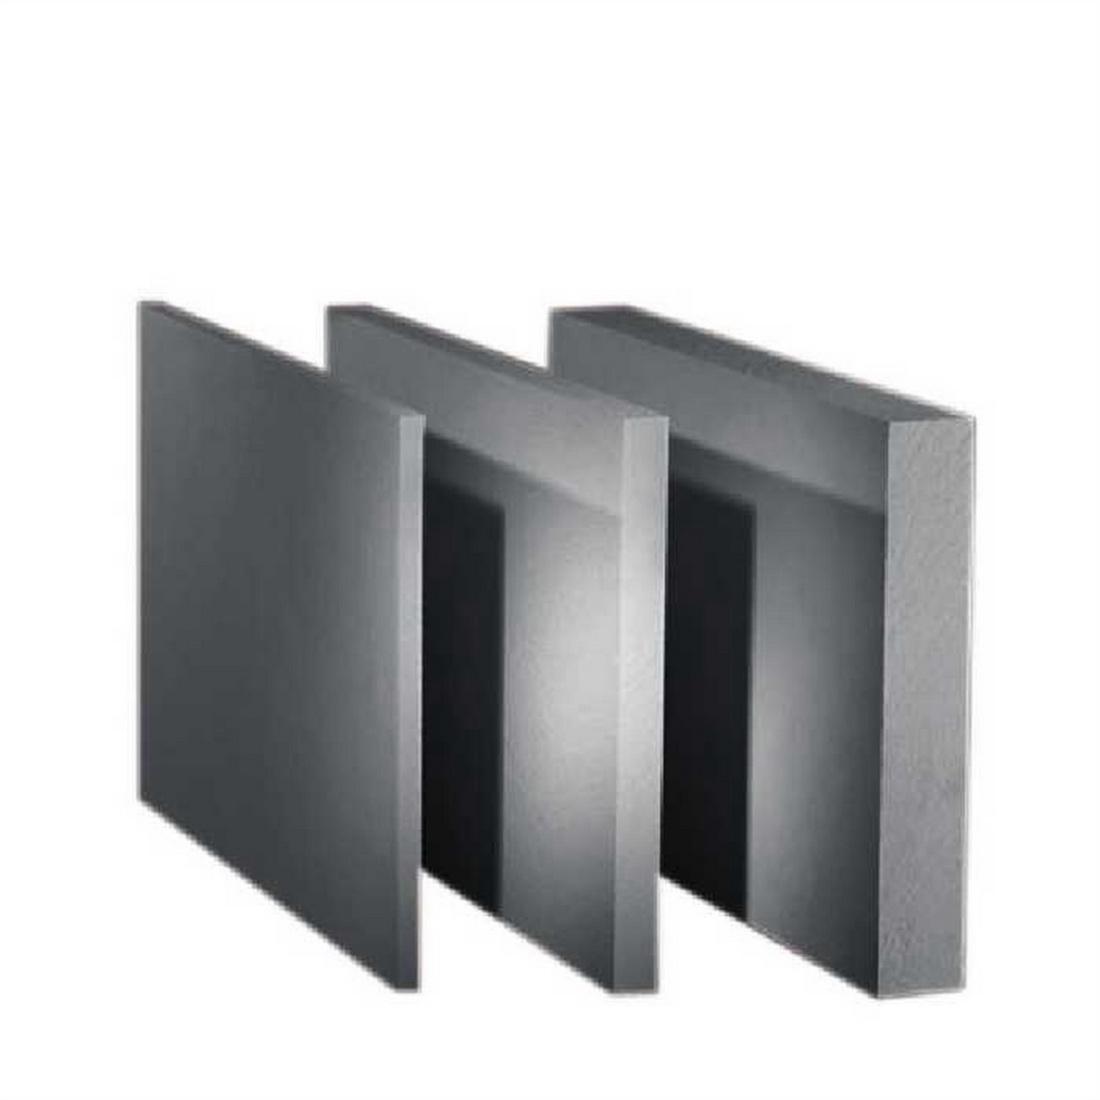 Expol Platinum Board 2400 x 1200 x 40mm R1.25 Black Expanded Polystyrene N2440